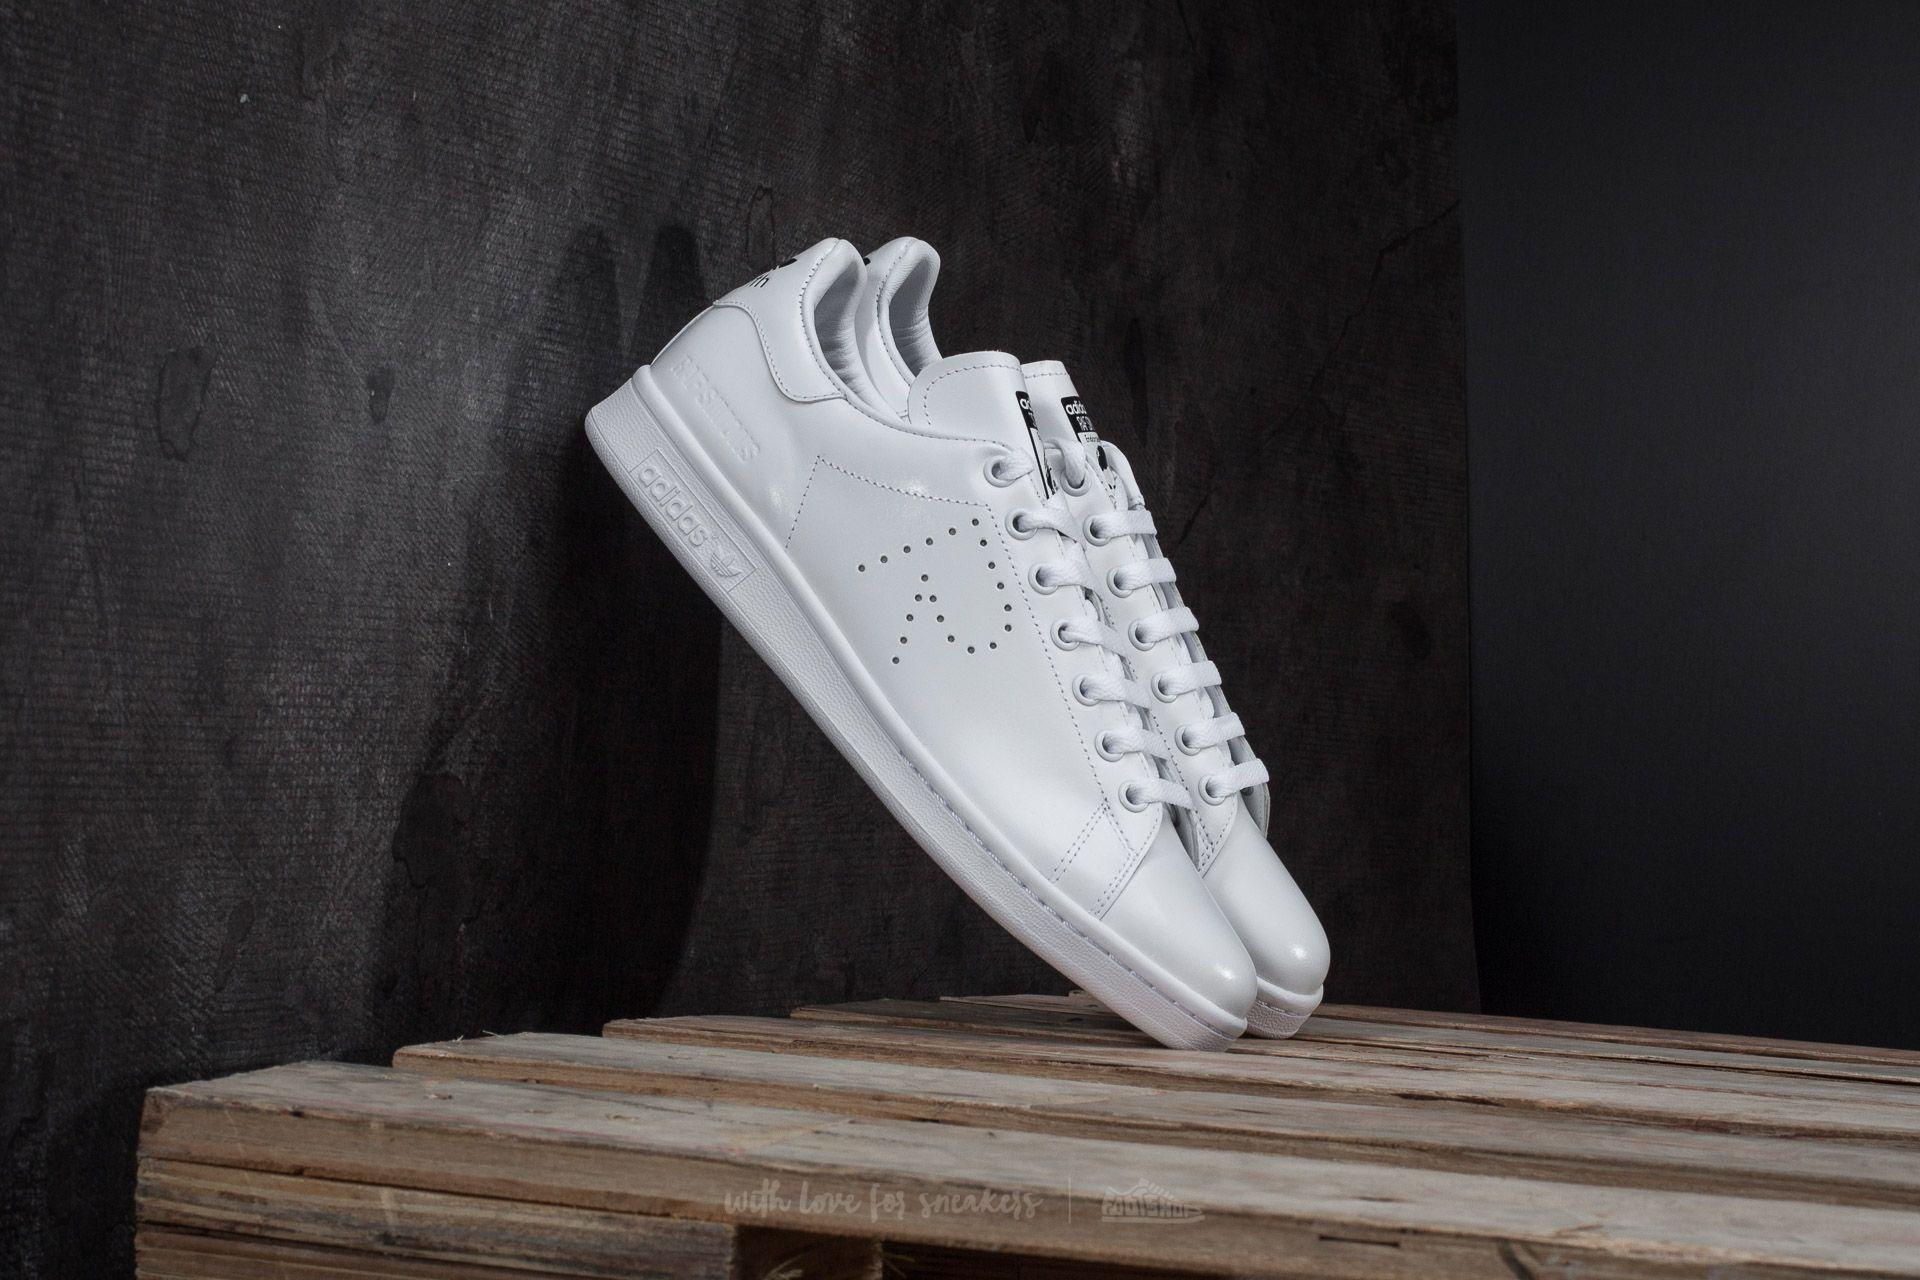 adidas x Raf Simons Stan Smith. Footwear White  Footwear White  Core Black b7c93f91dfb9